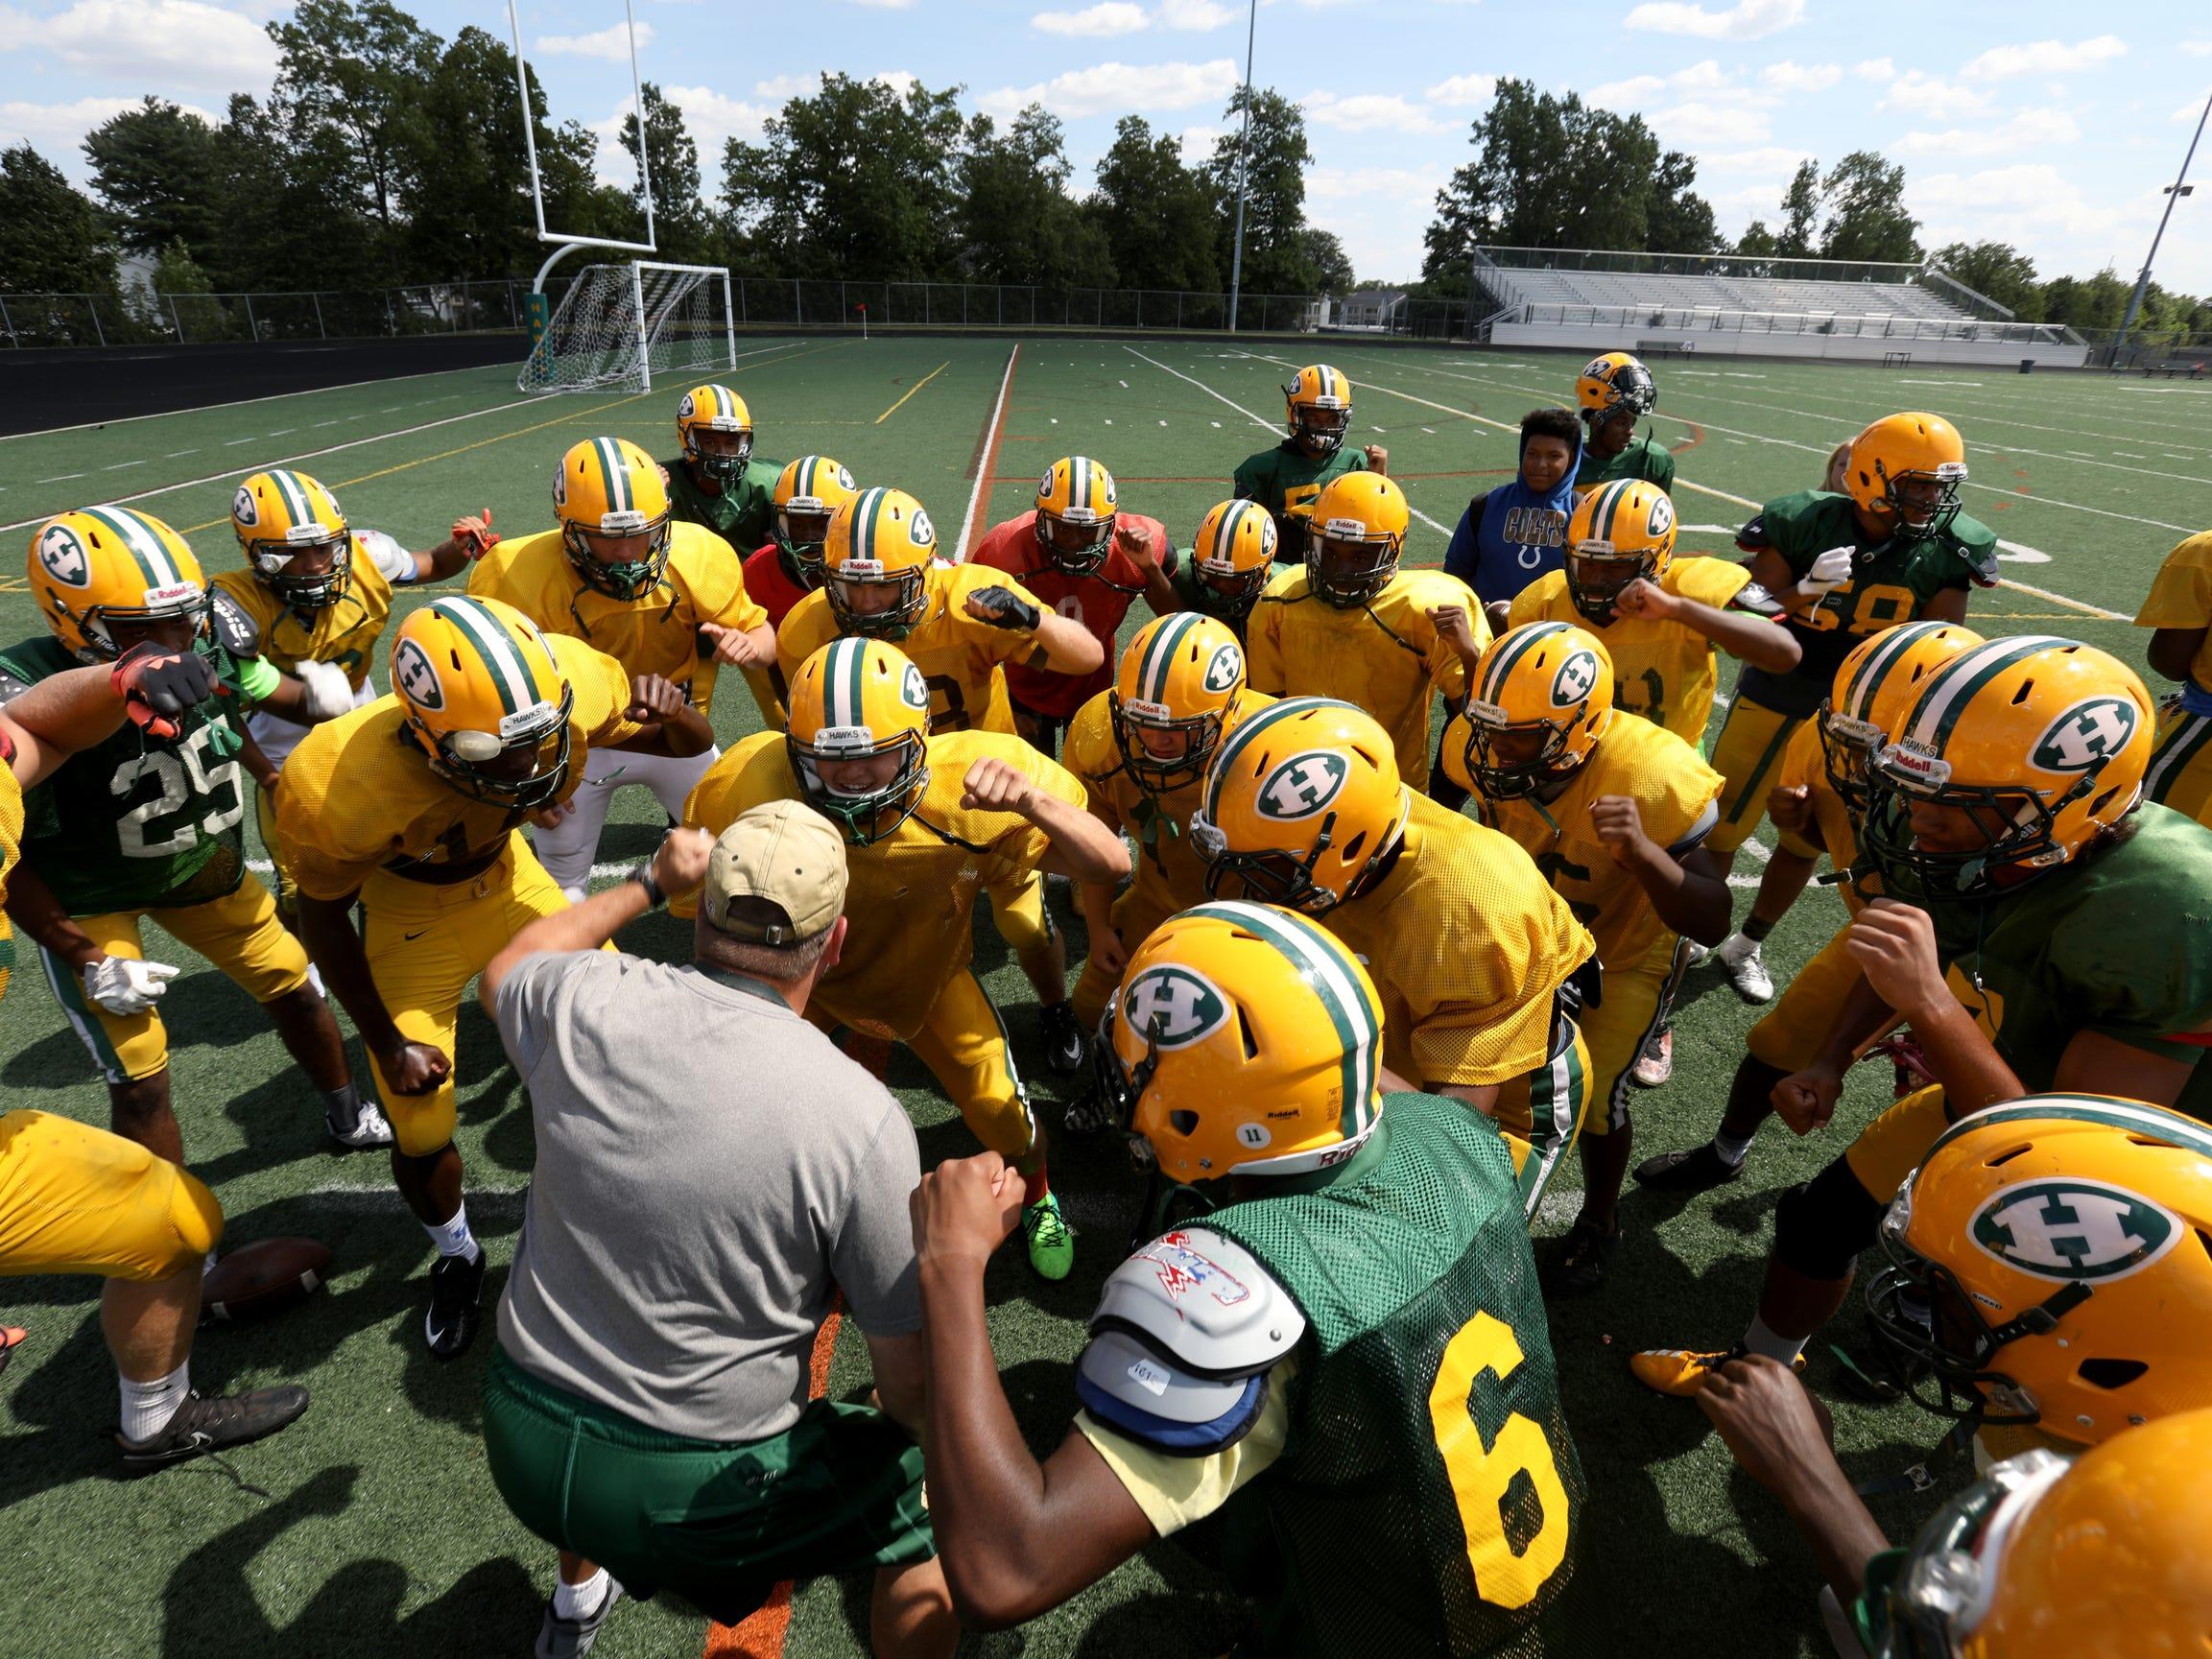 Farmington Hills Harrison High School defensive coordinator Dave Thorne huddles up his team after practice at the school in Farmington Hills, Michigan on Thursday, Aug. 23, 2018.